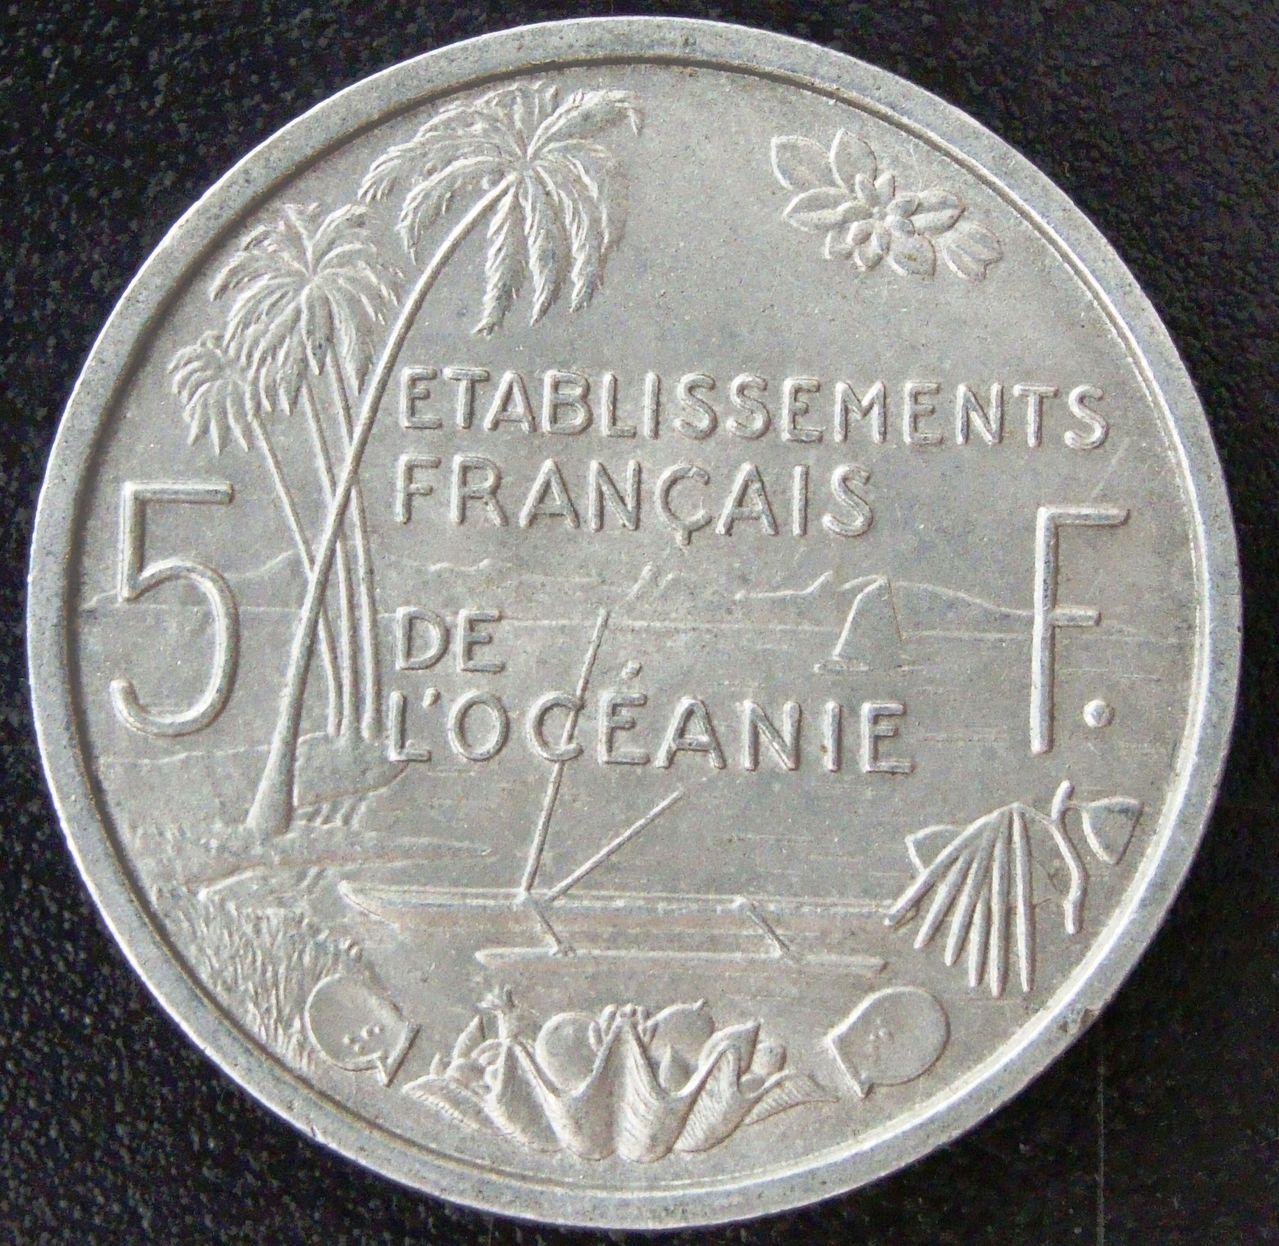 5 Francos. Oceanía francesa (1952) PLI_5_Francos_1952_rev